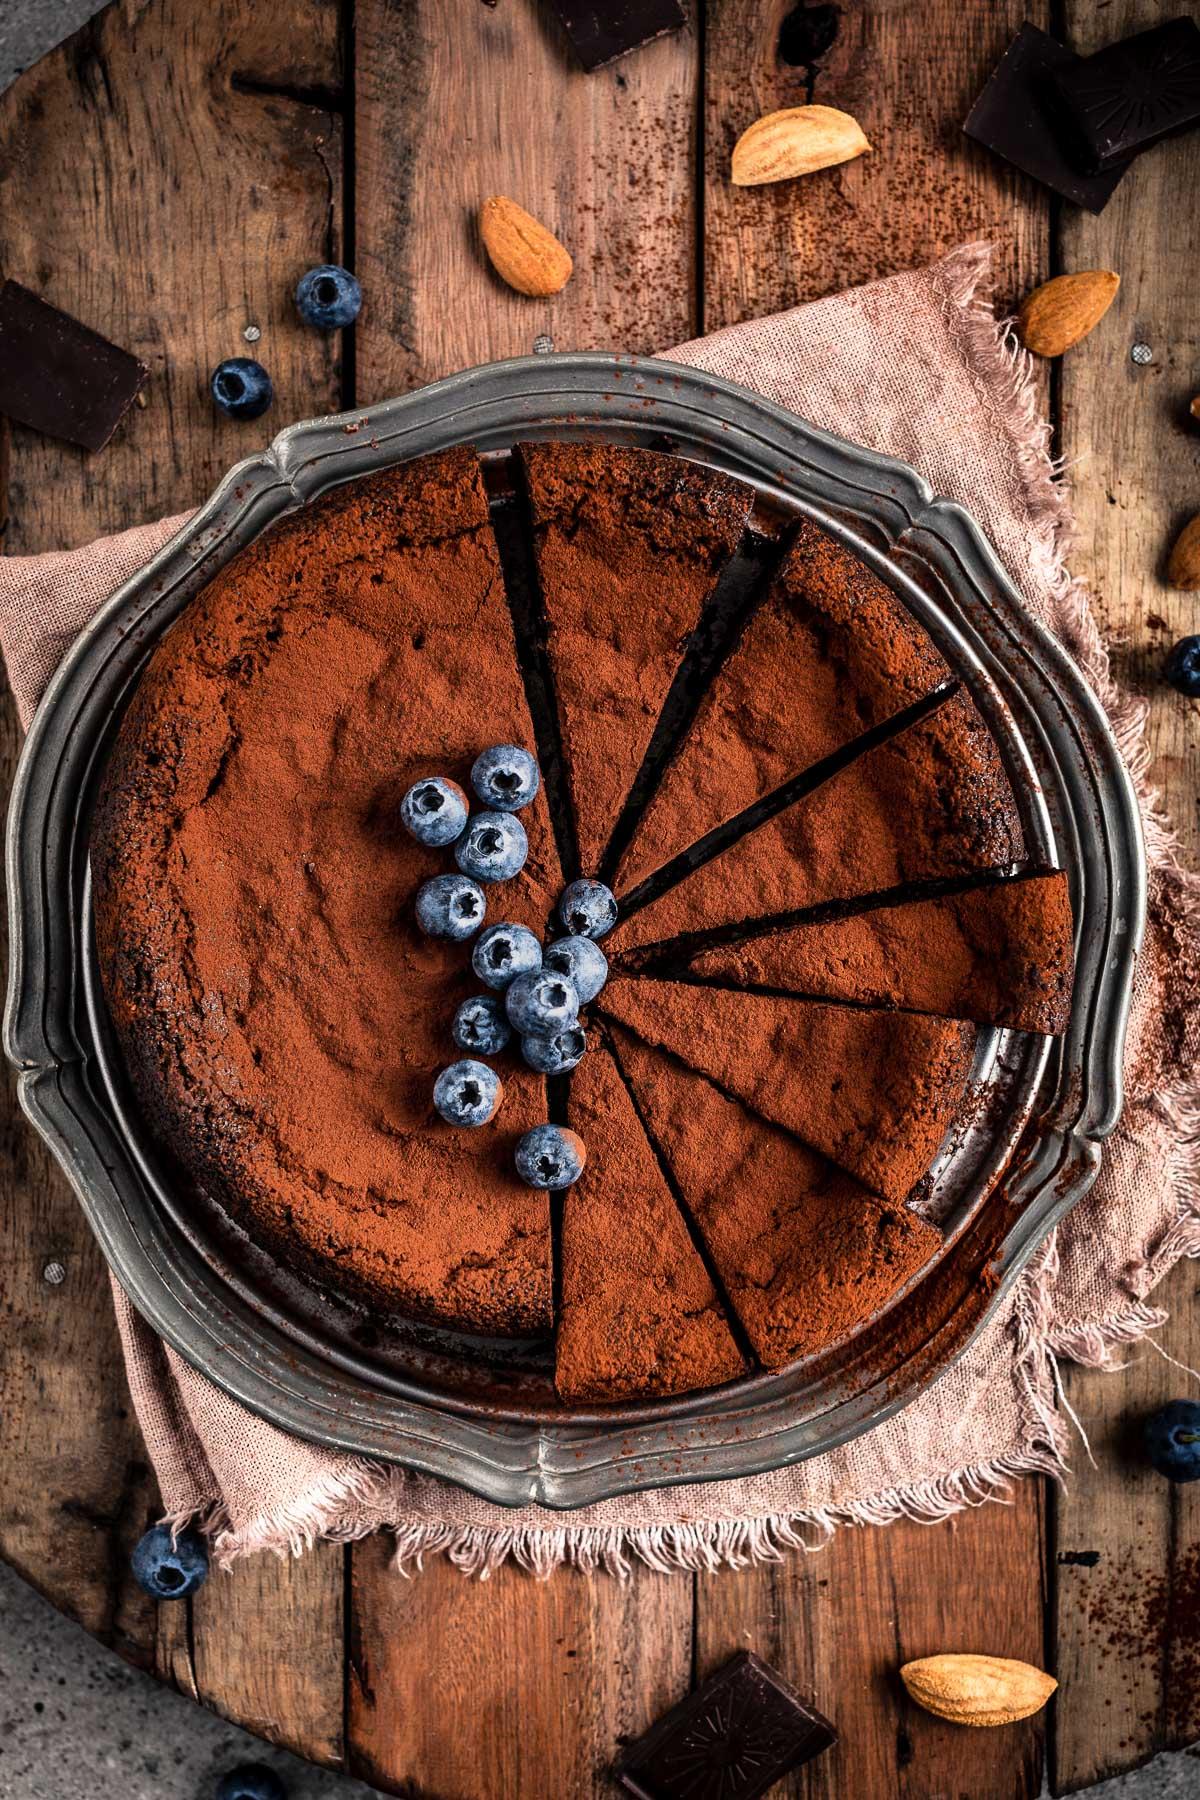 ricetta TORTA al CIOCCOLATO e MANDORLE vegan senza glutine senza farina gluten-free FLOURLESS VEGAN CHOCOLATE CAKE #paleo